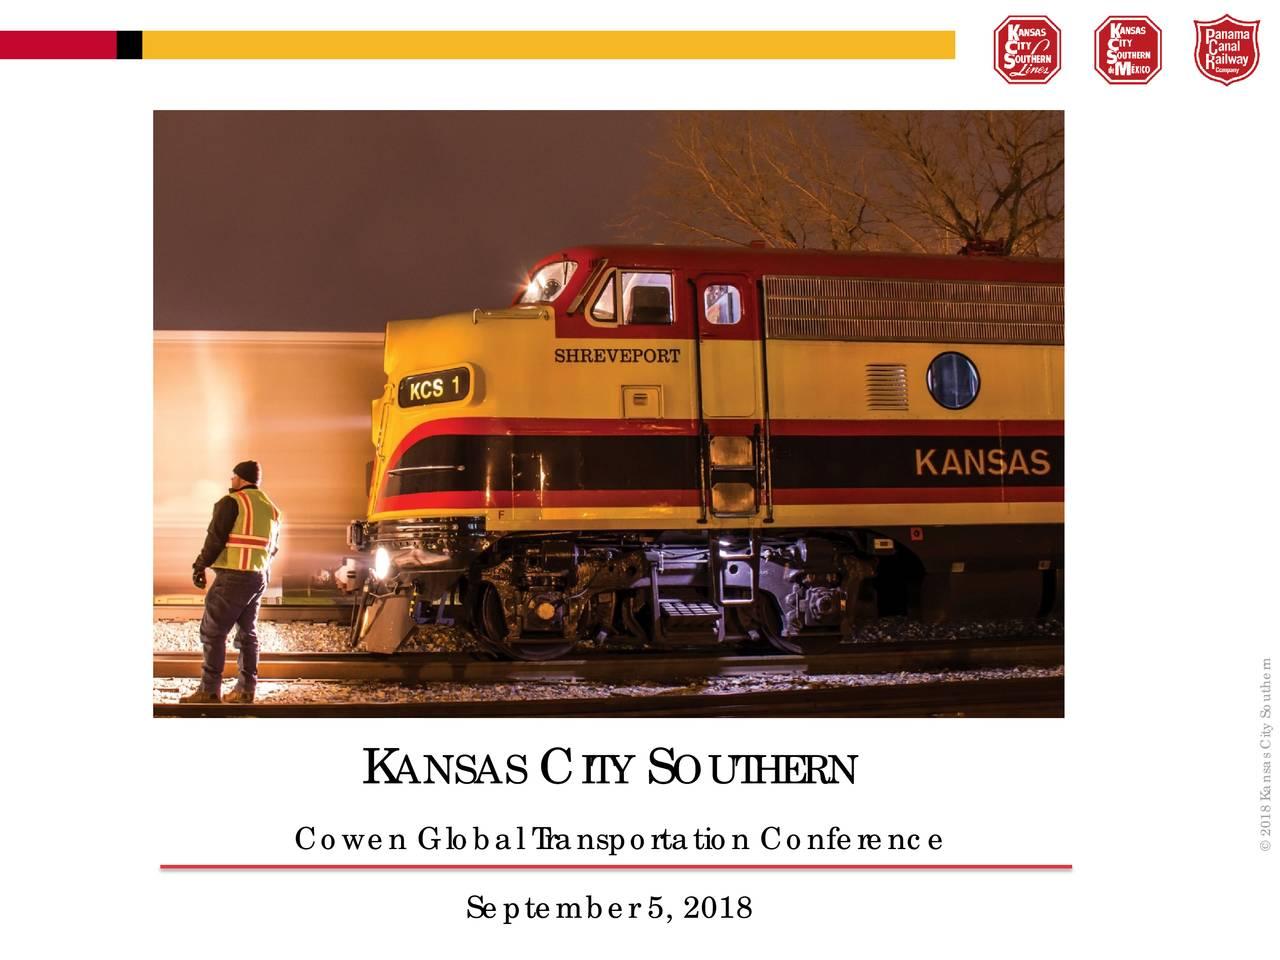 Cowen Global Transportation Conference © 2018 Kansas City Southern September 5, 2018